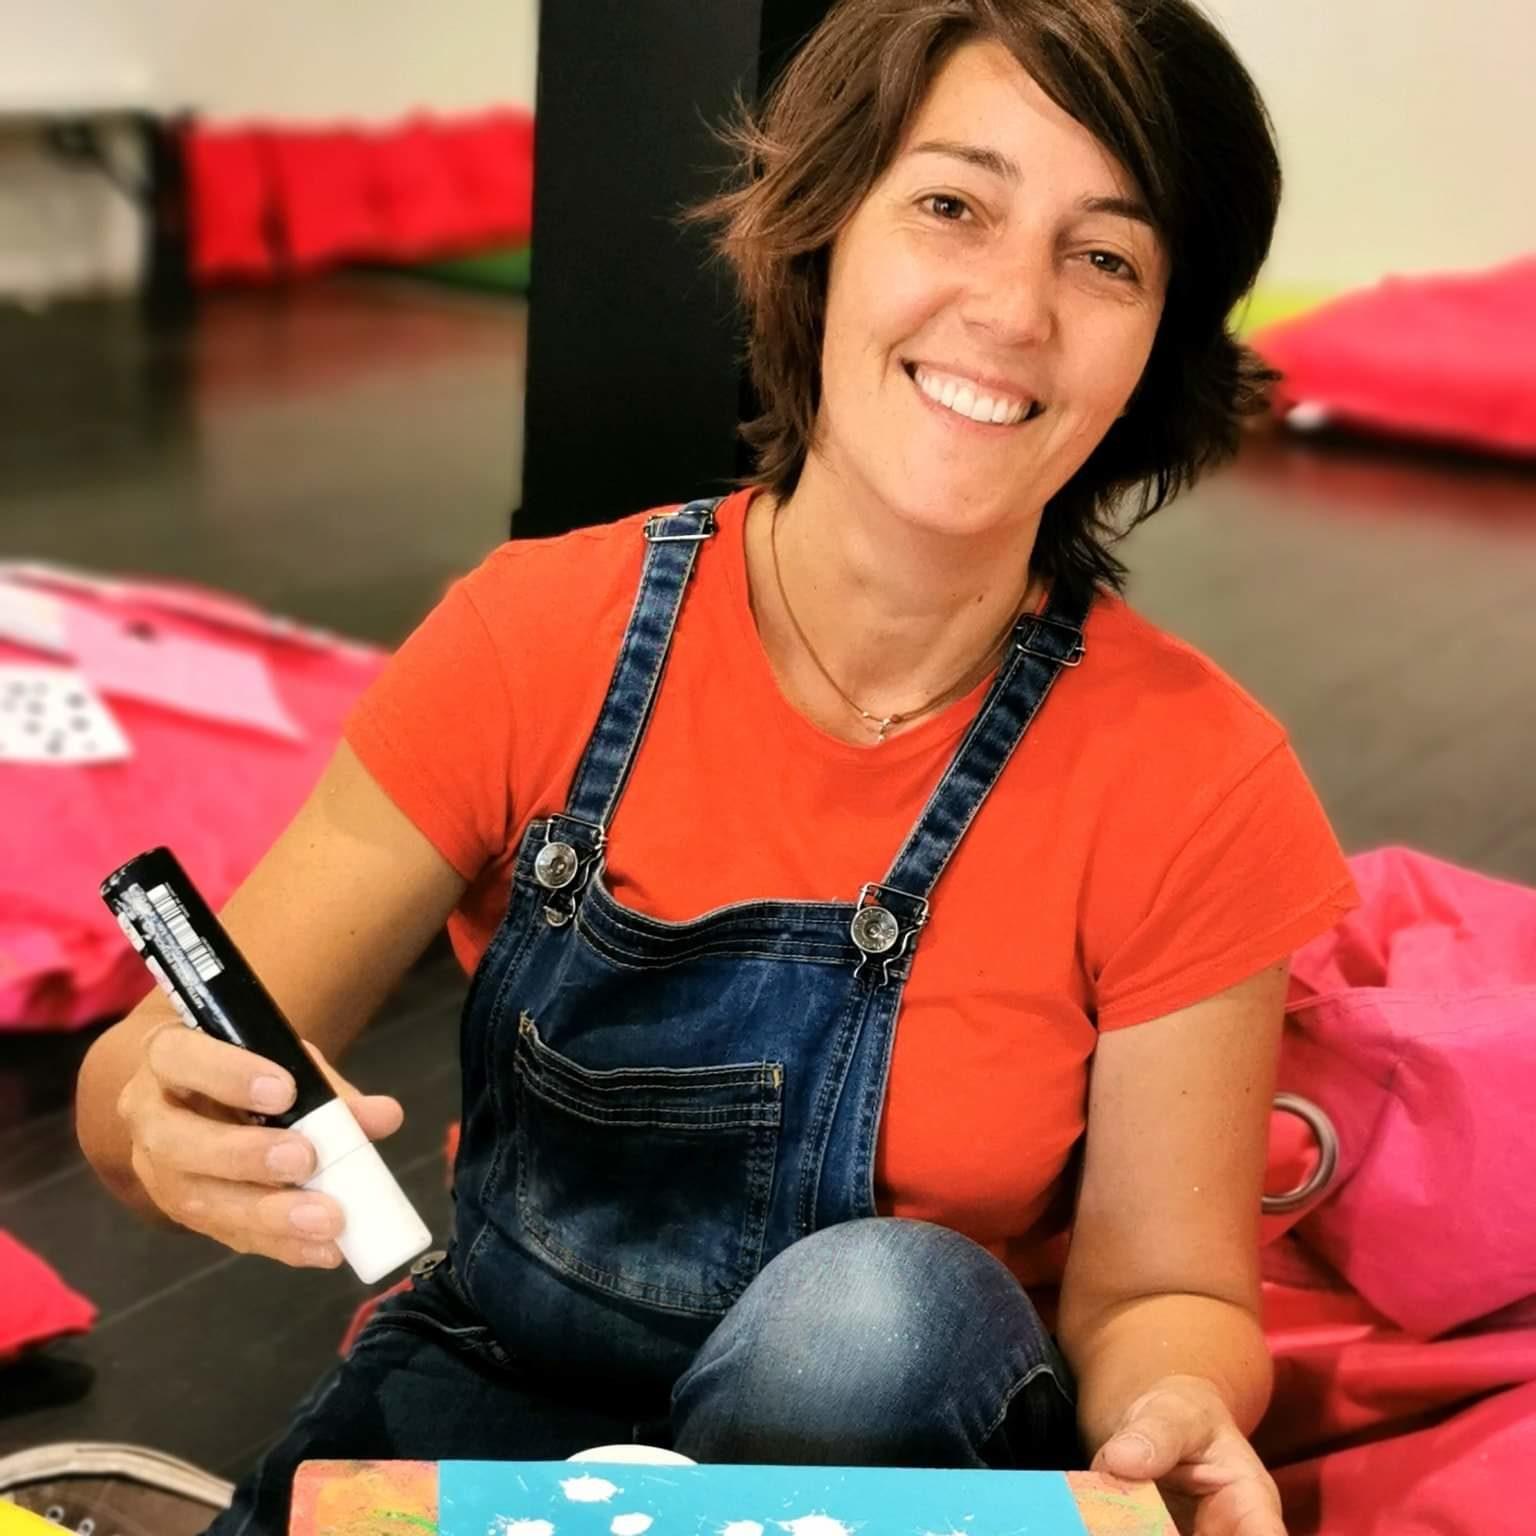 Valia, fondatrice de KID & Sens, club d'activités parent enfant à Aix en Provence